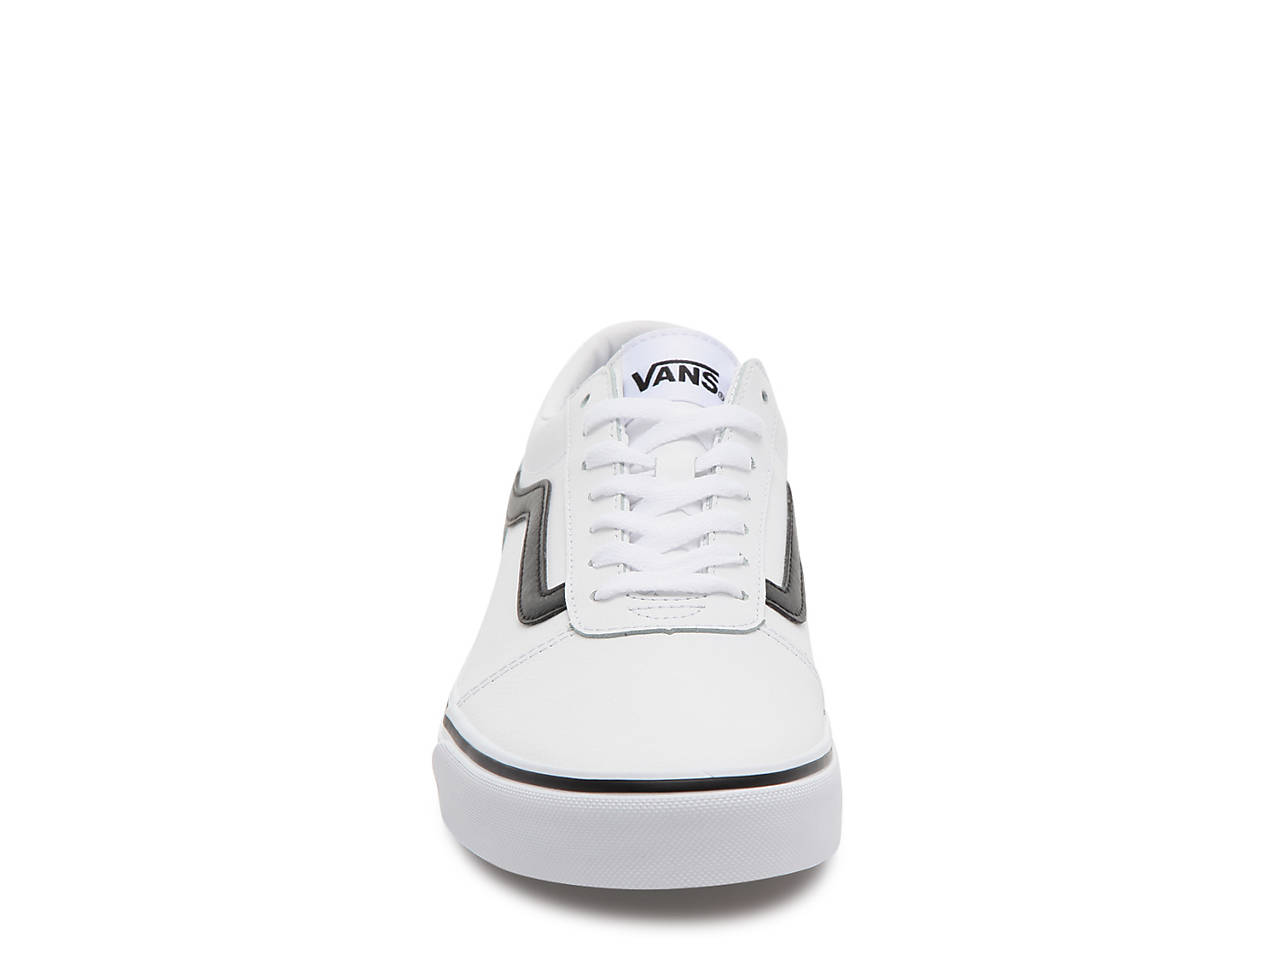 competitive price 29064 8c194 Vans Ward Lo Leather Sneaker - Men s Men s Shoes   DSW